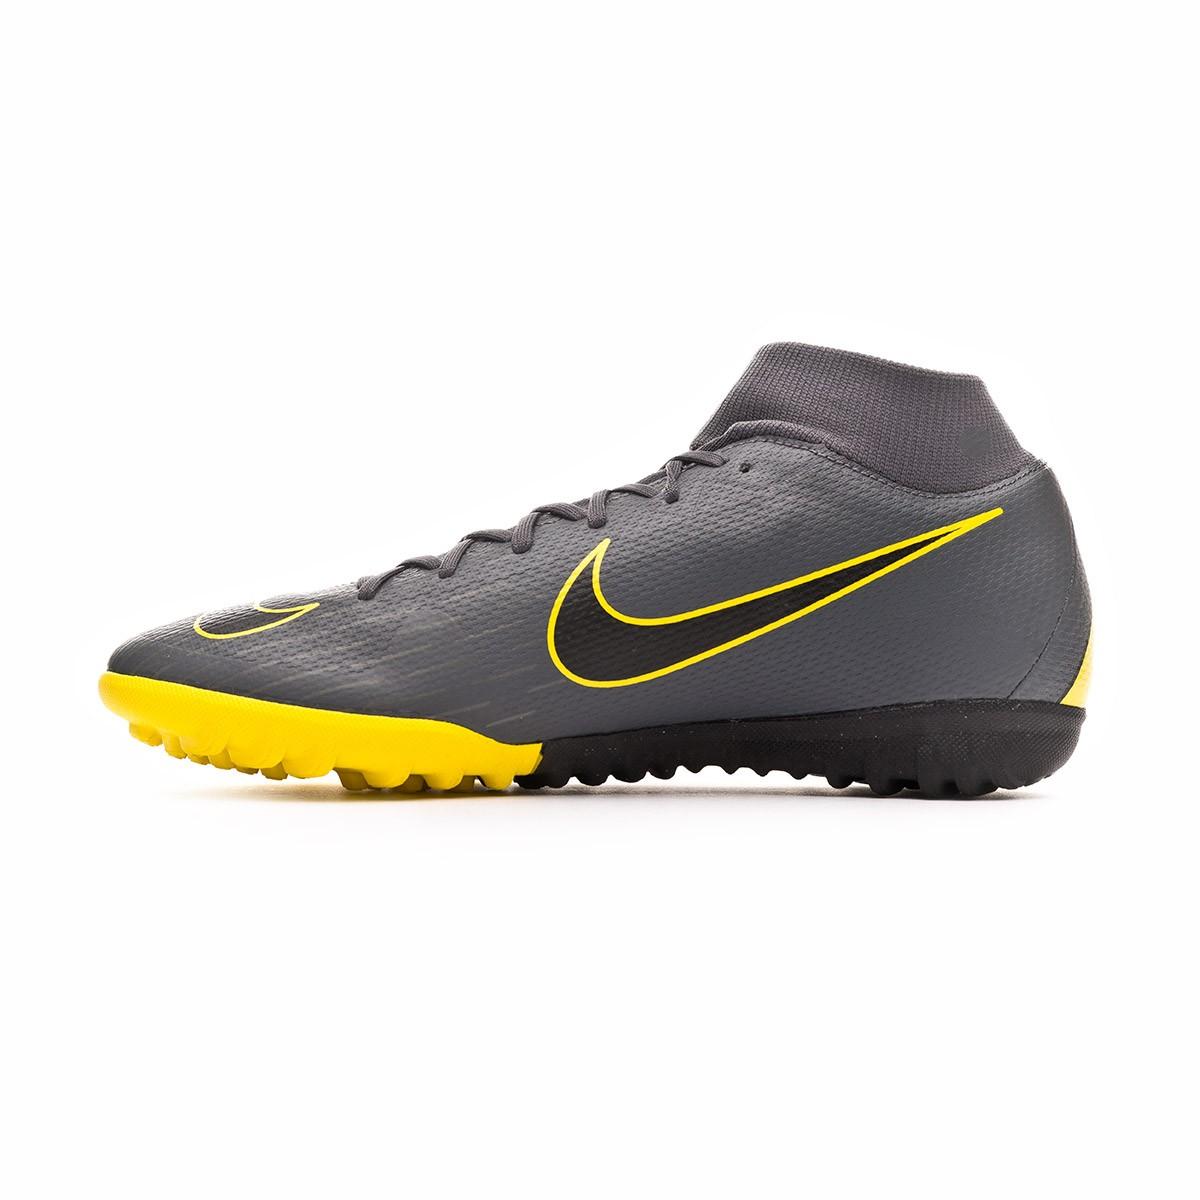 Sapatilhas Nike Mercurial SuperflyX VI Academy Turf